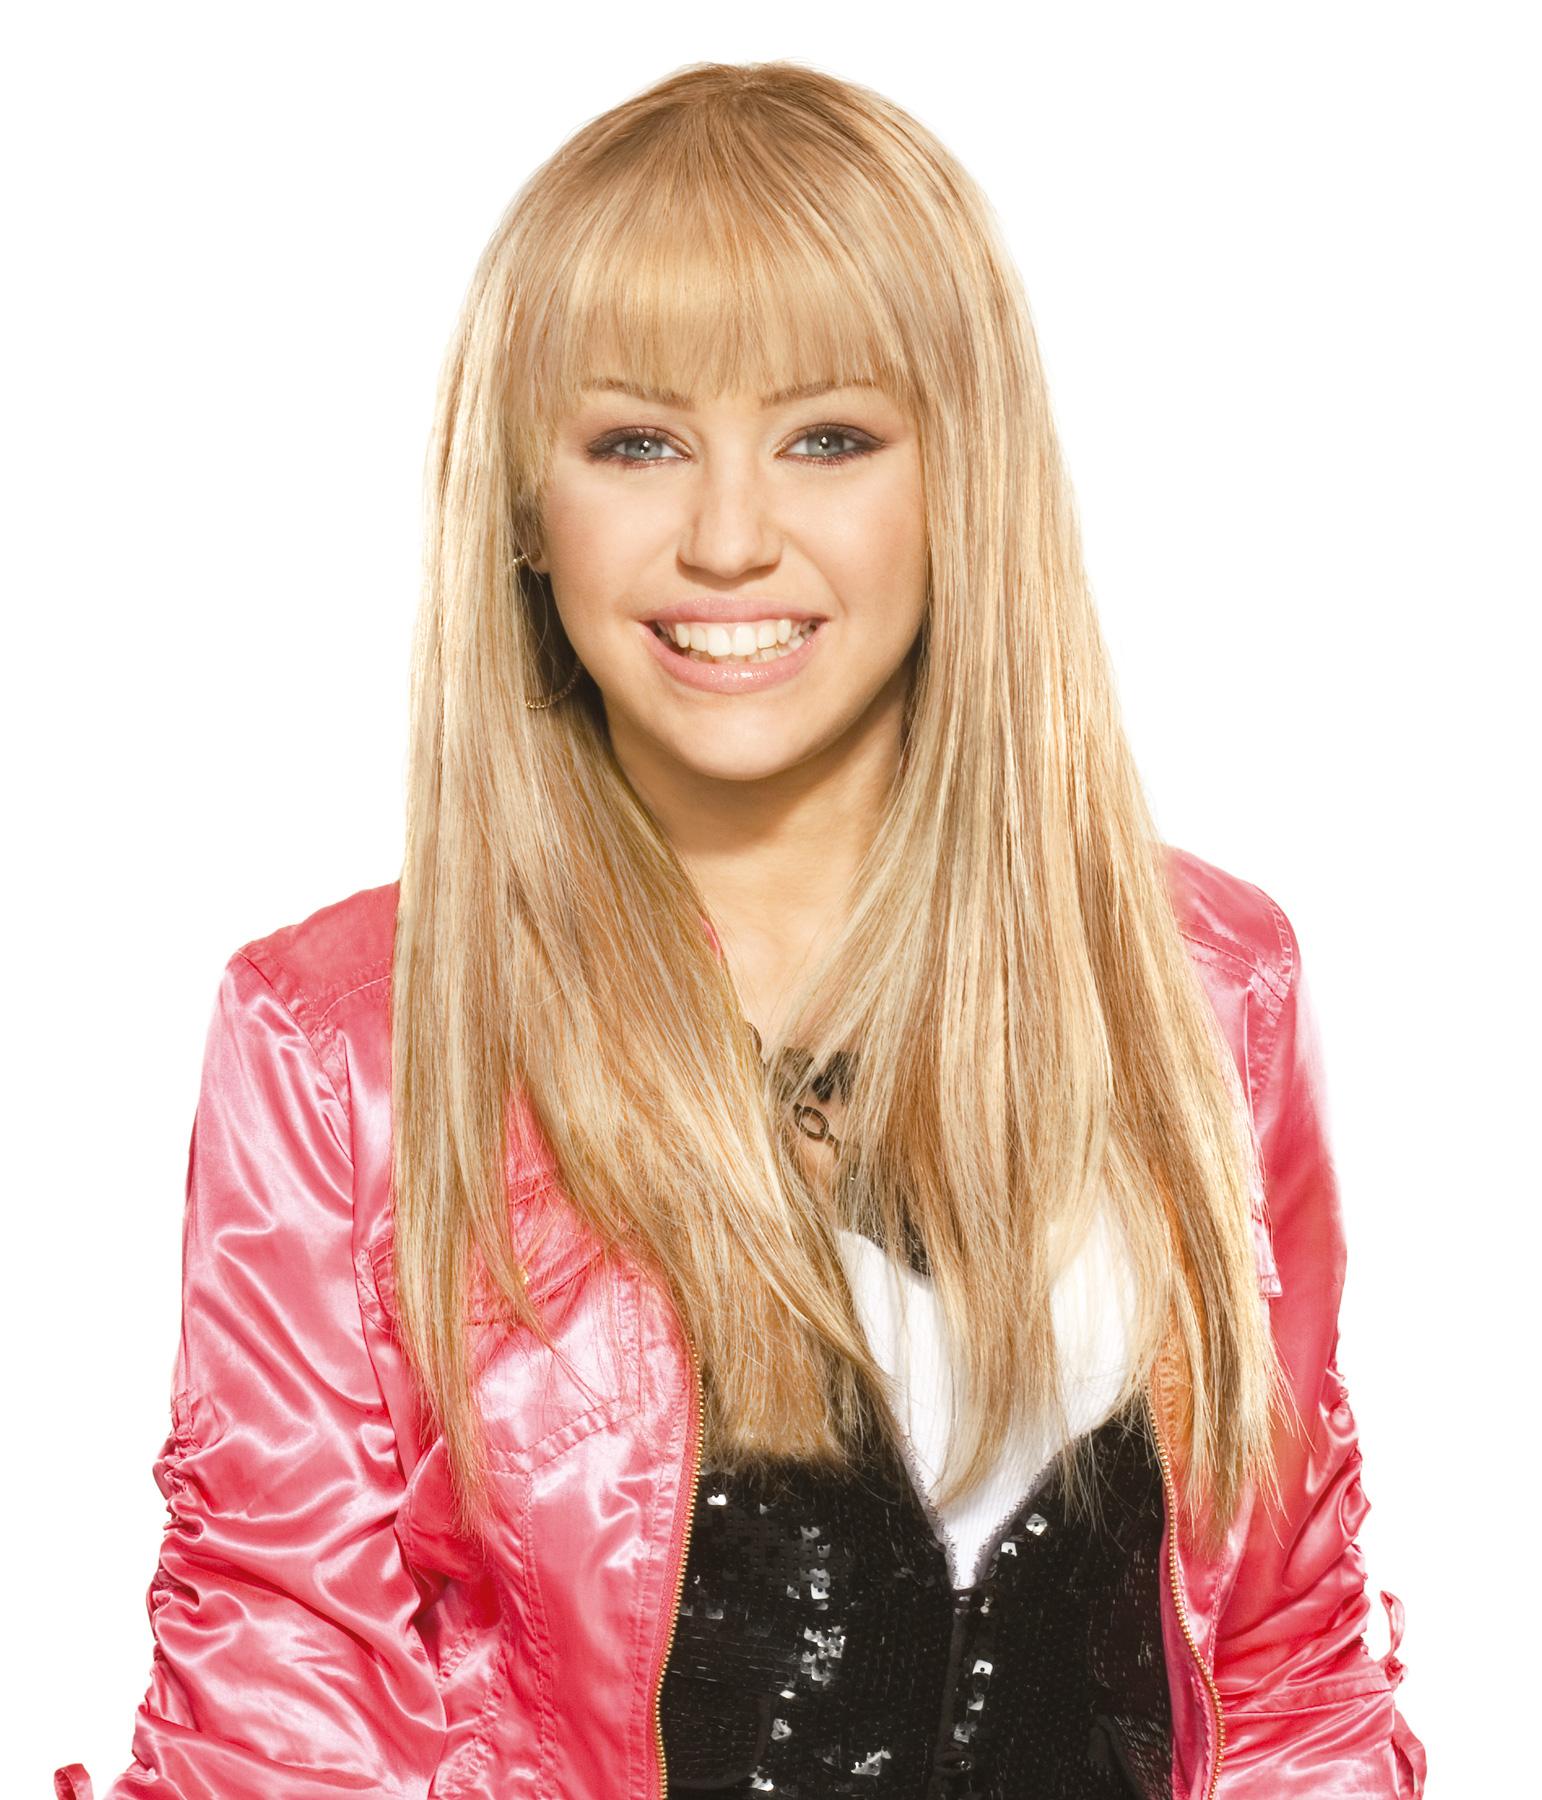 Hannah Montana, Miley Cyrus - Hannah Montana 2: Meet Miley Cyrus